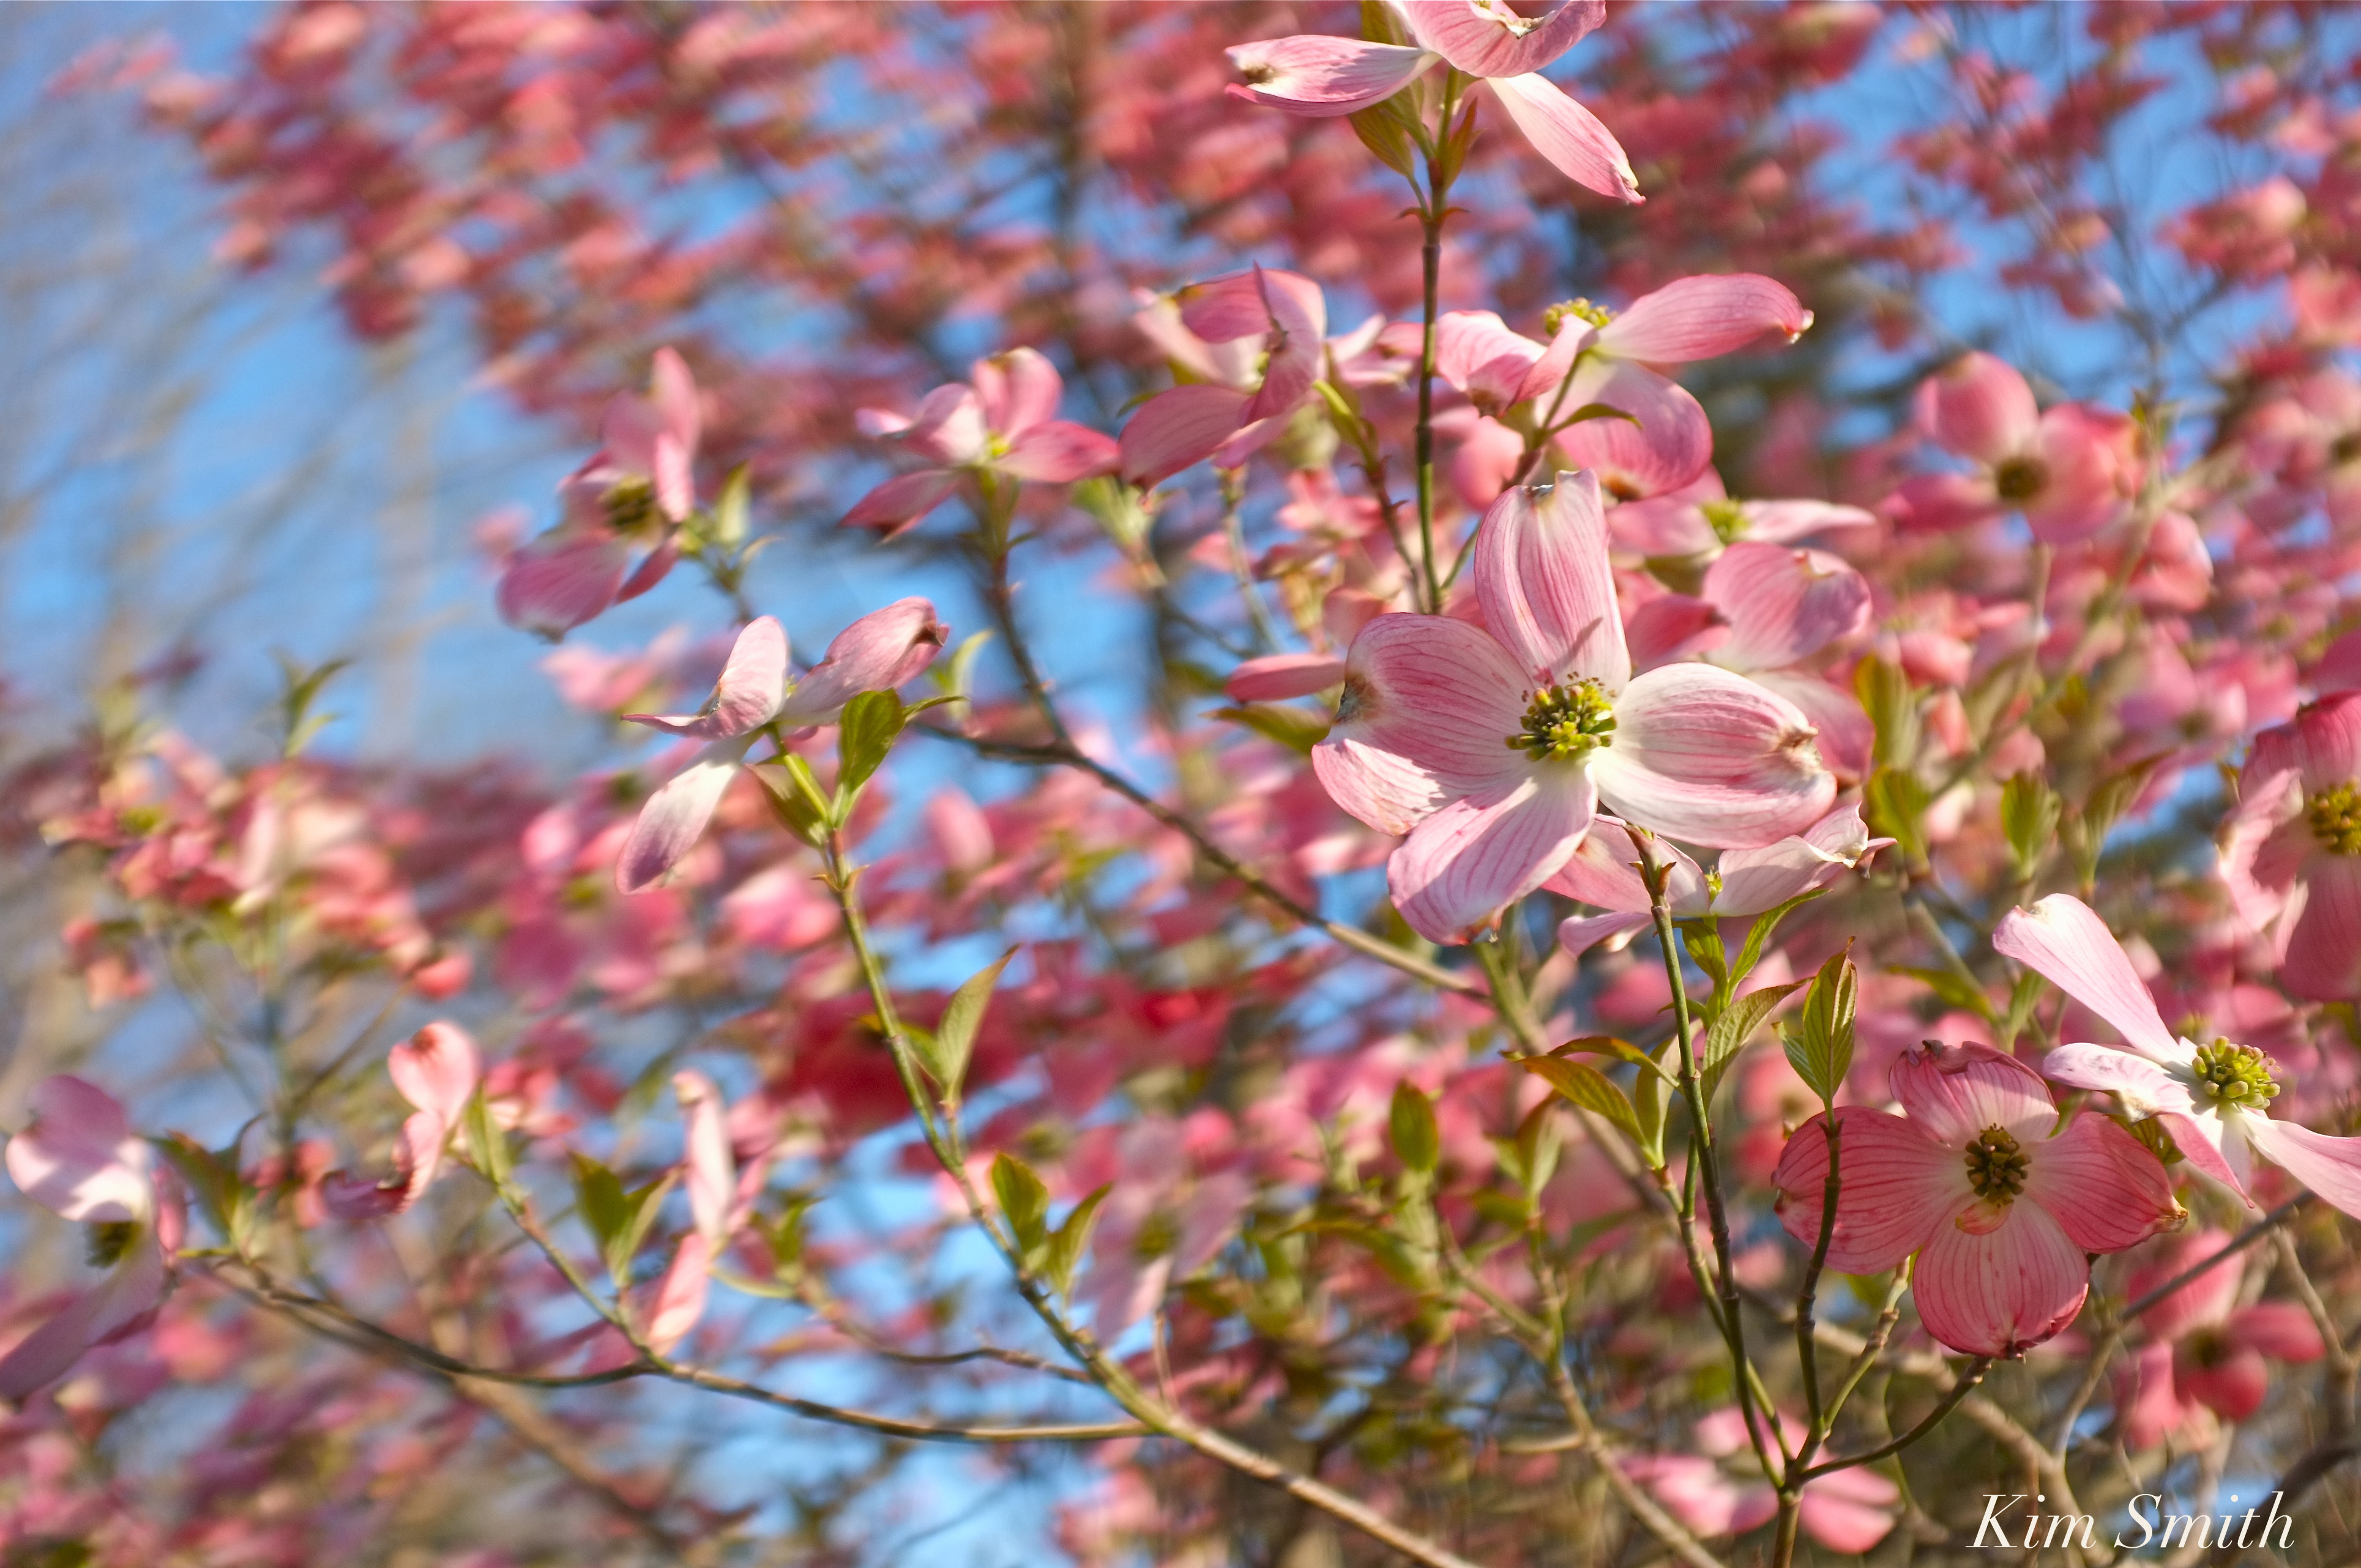 Pink Flowering Dogwood Cornus Florida Rubra Copyright Kim Smith